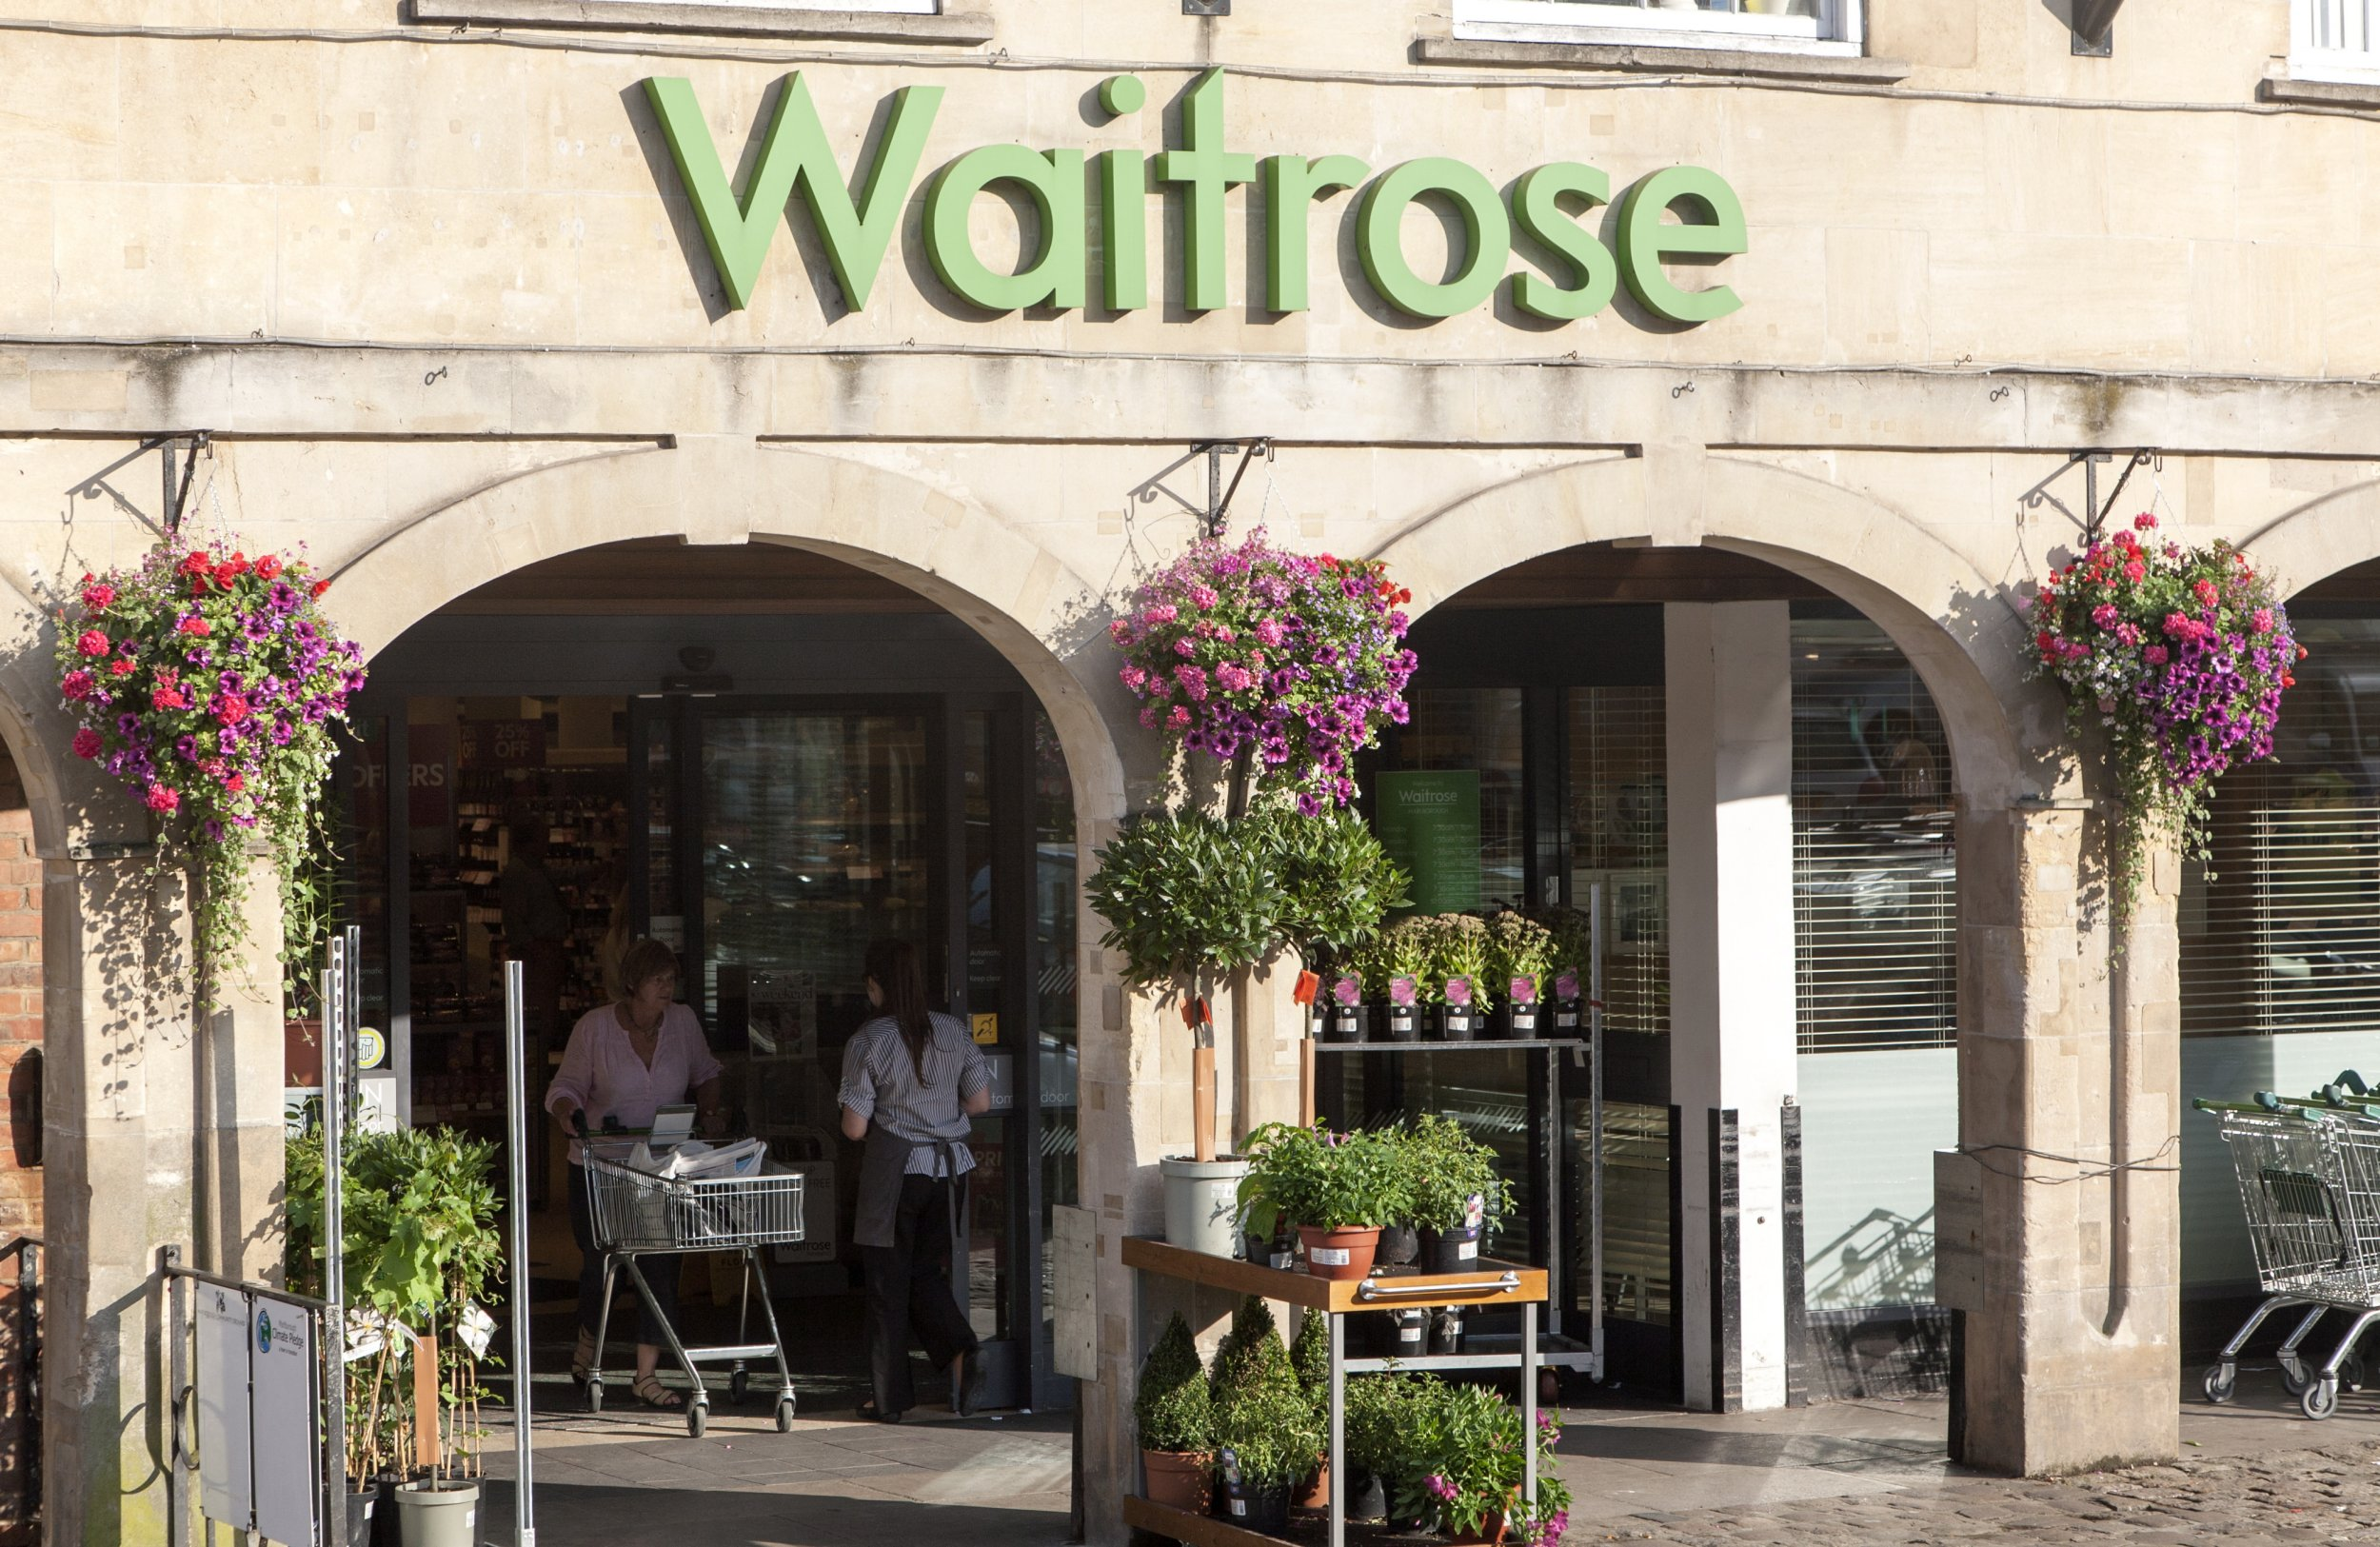 Waitrose supermarket store, Marlborough, Wiltshire, England. (Photo By: Geography Photos/UIG via Getty Images)